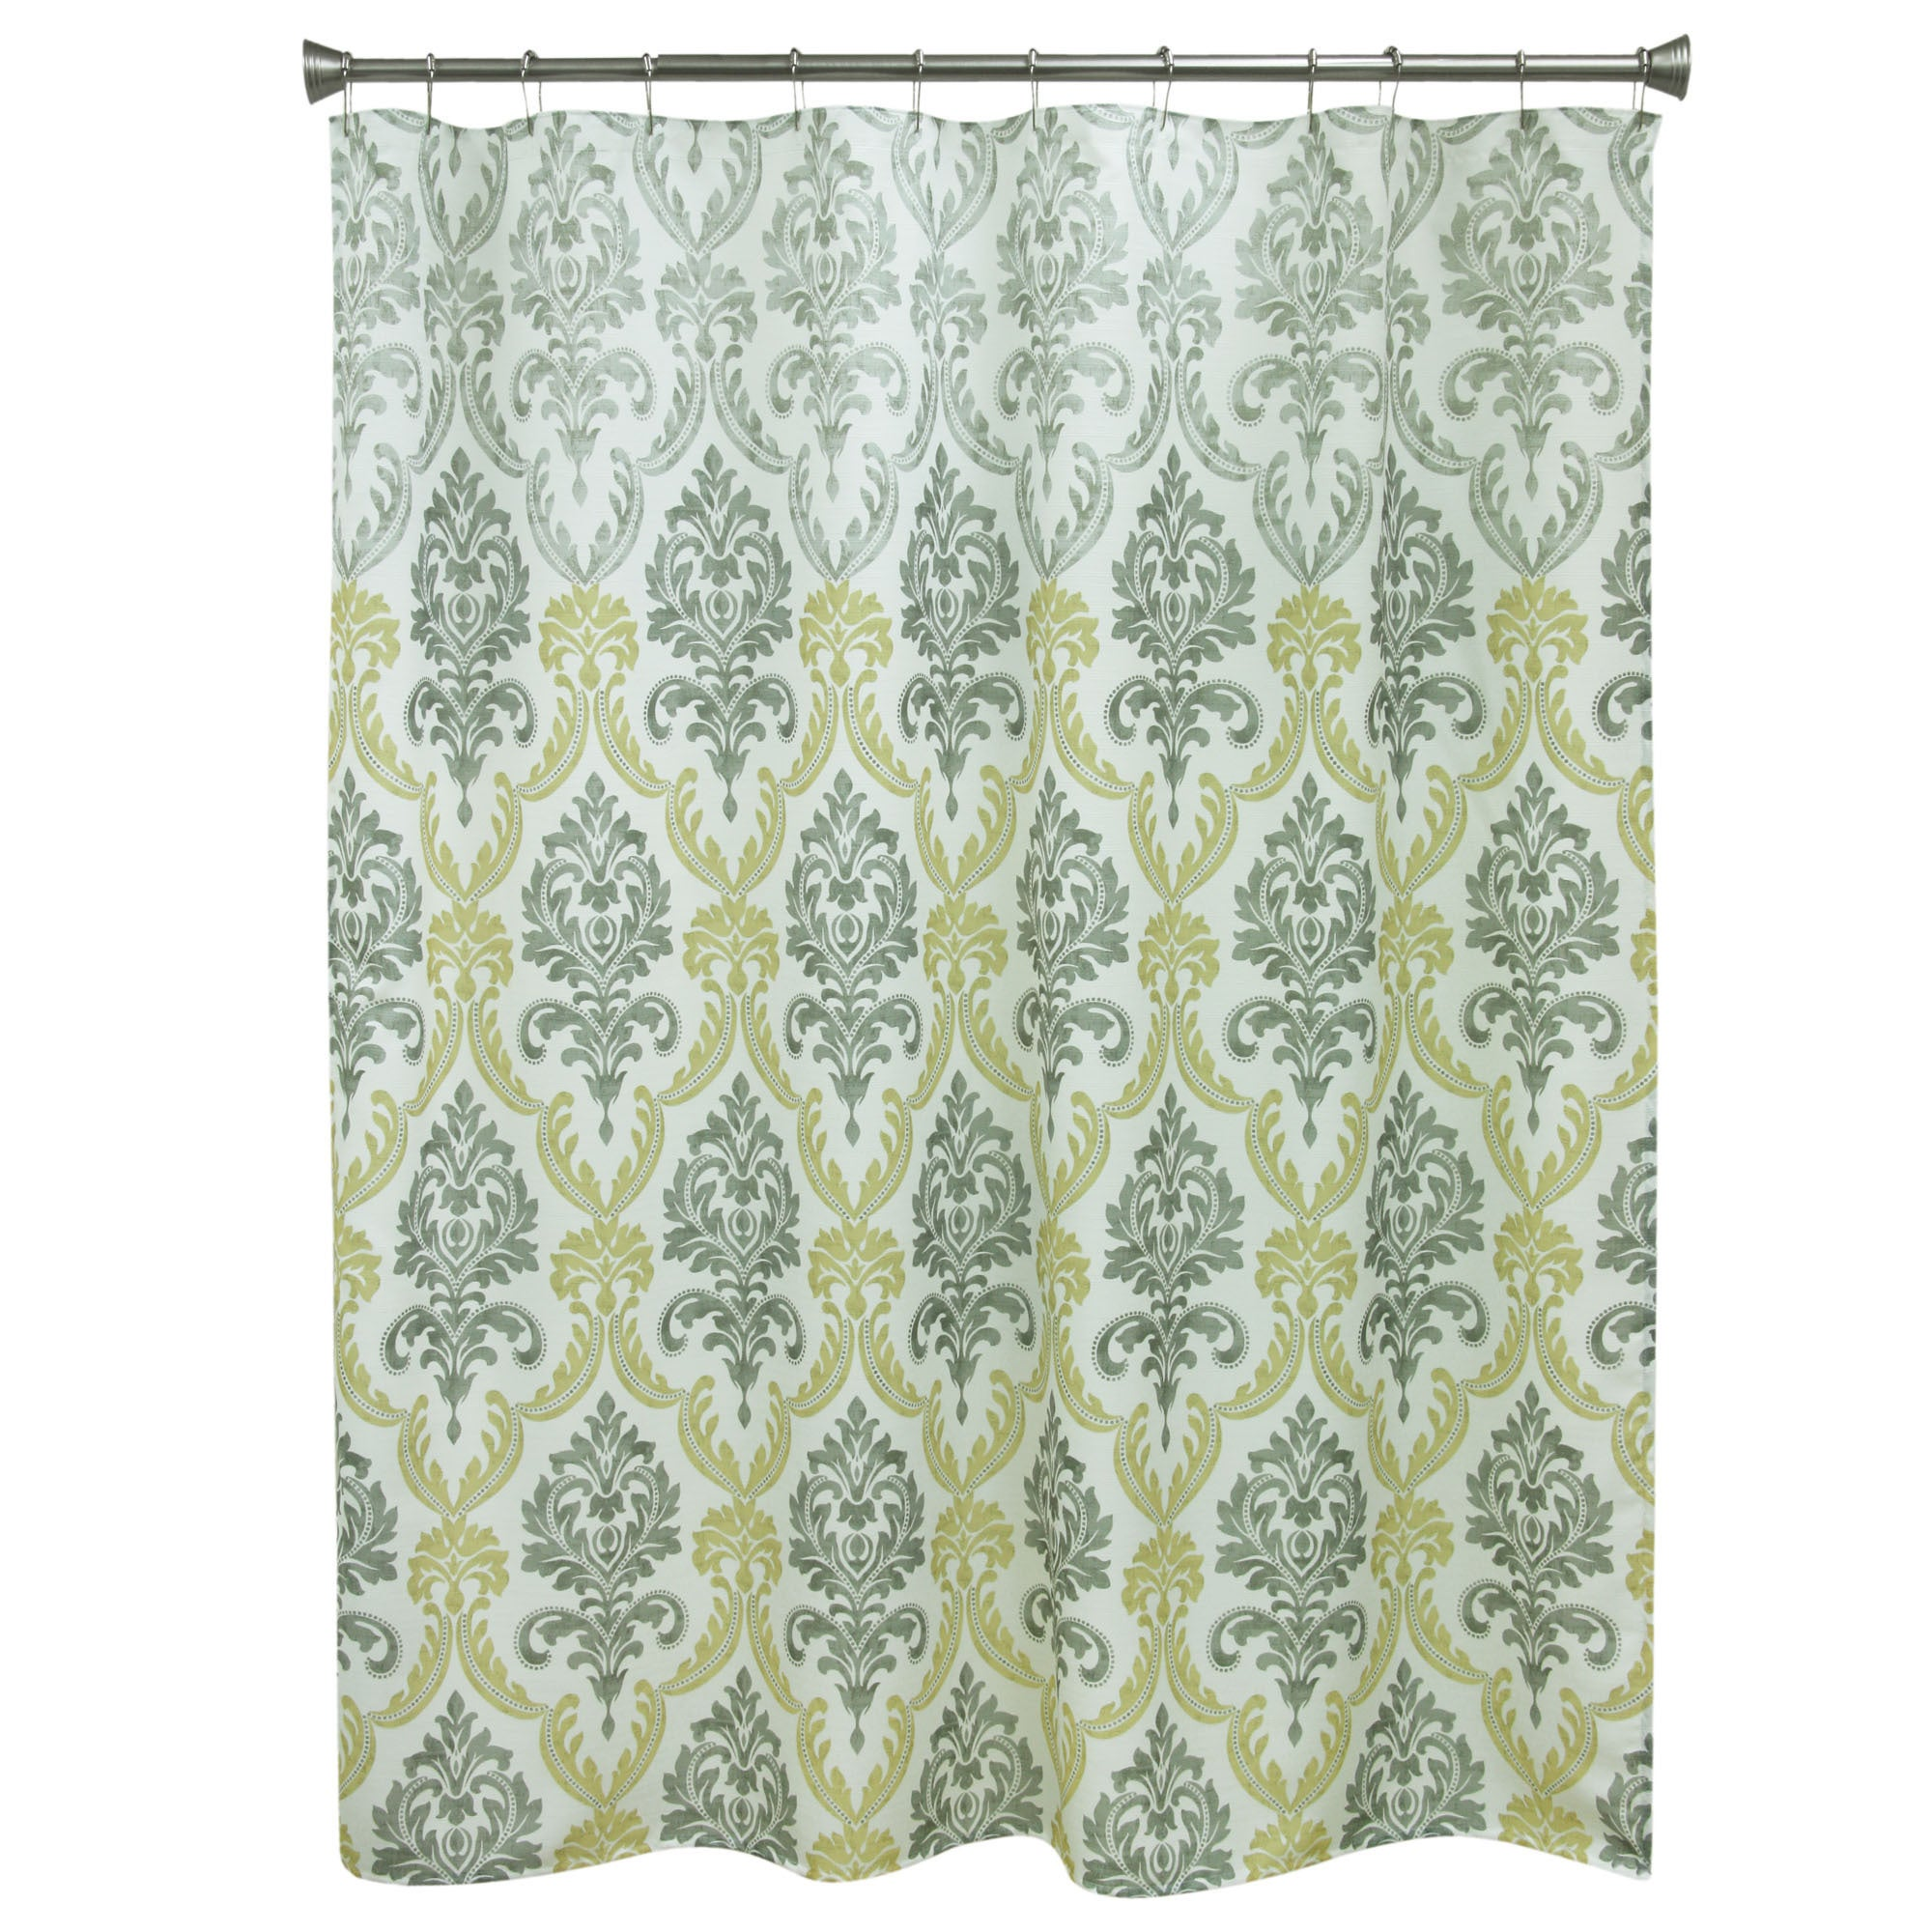 BACOVA Portico Yellow Fabric Shower Curtain (Portico yell...